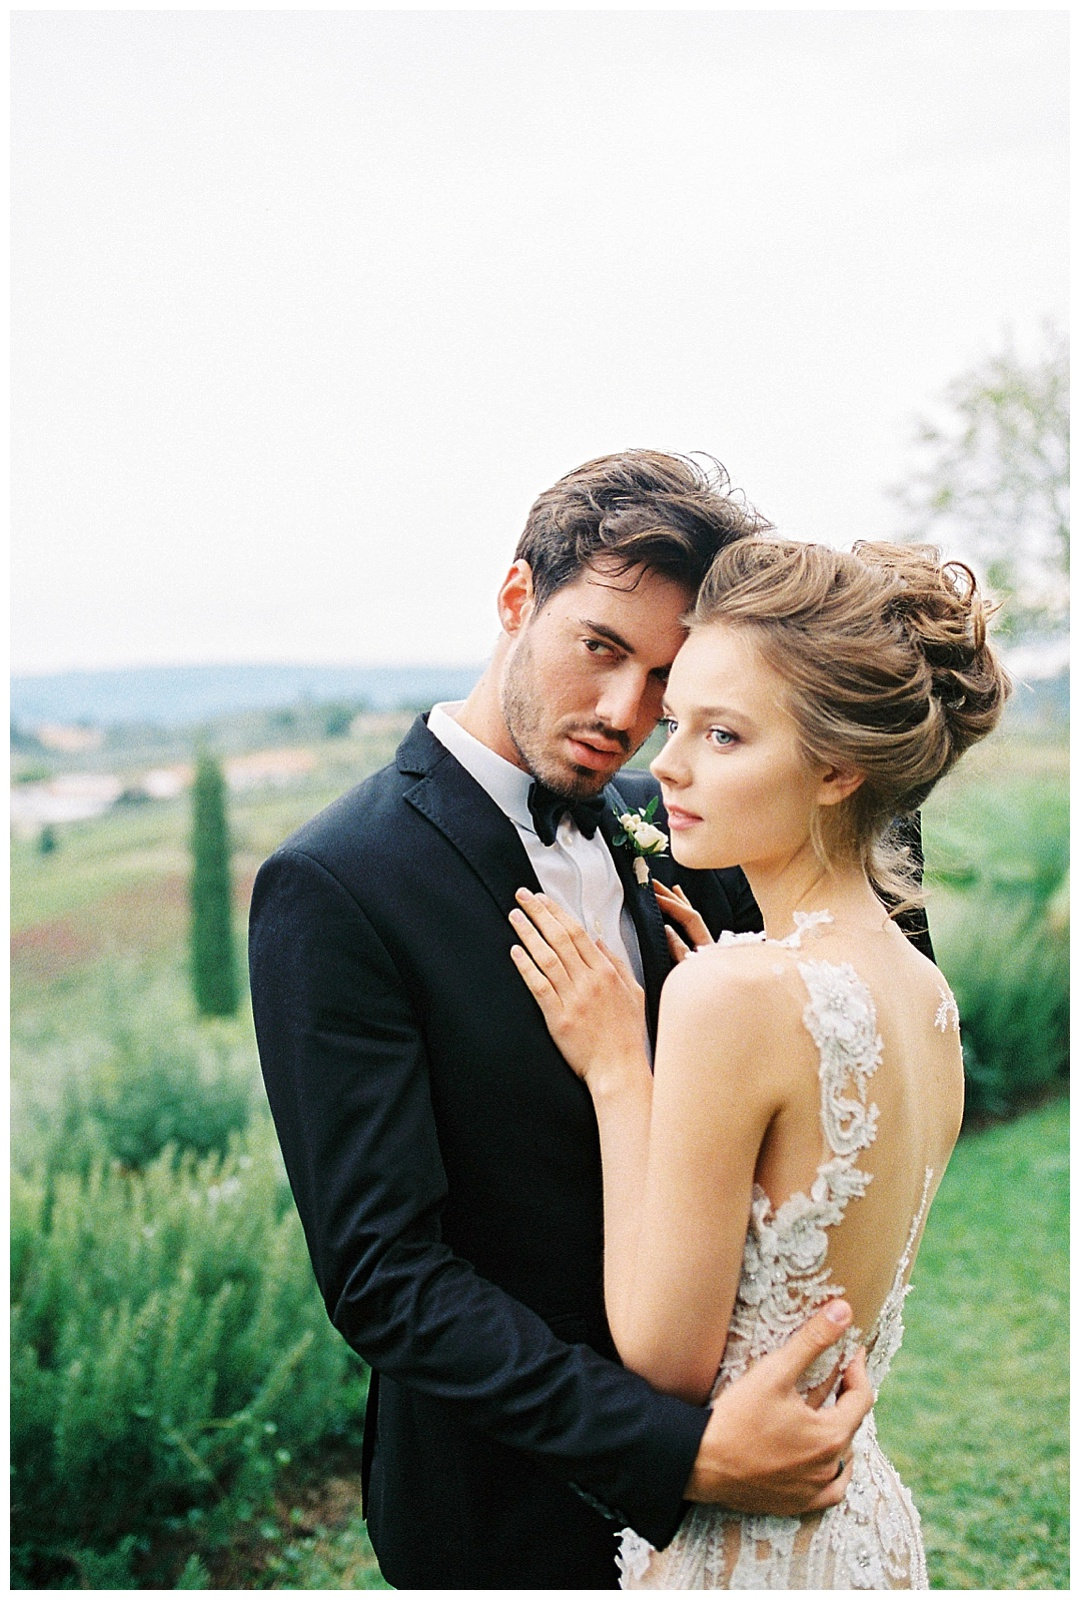 We_Can _Be_Heroes_alternative_wedding_photographer_Tuscany_wedding_film_0011